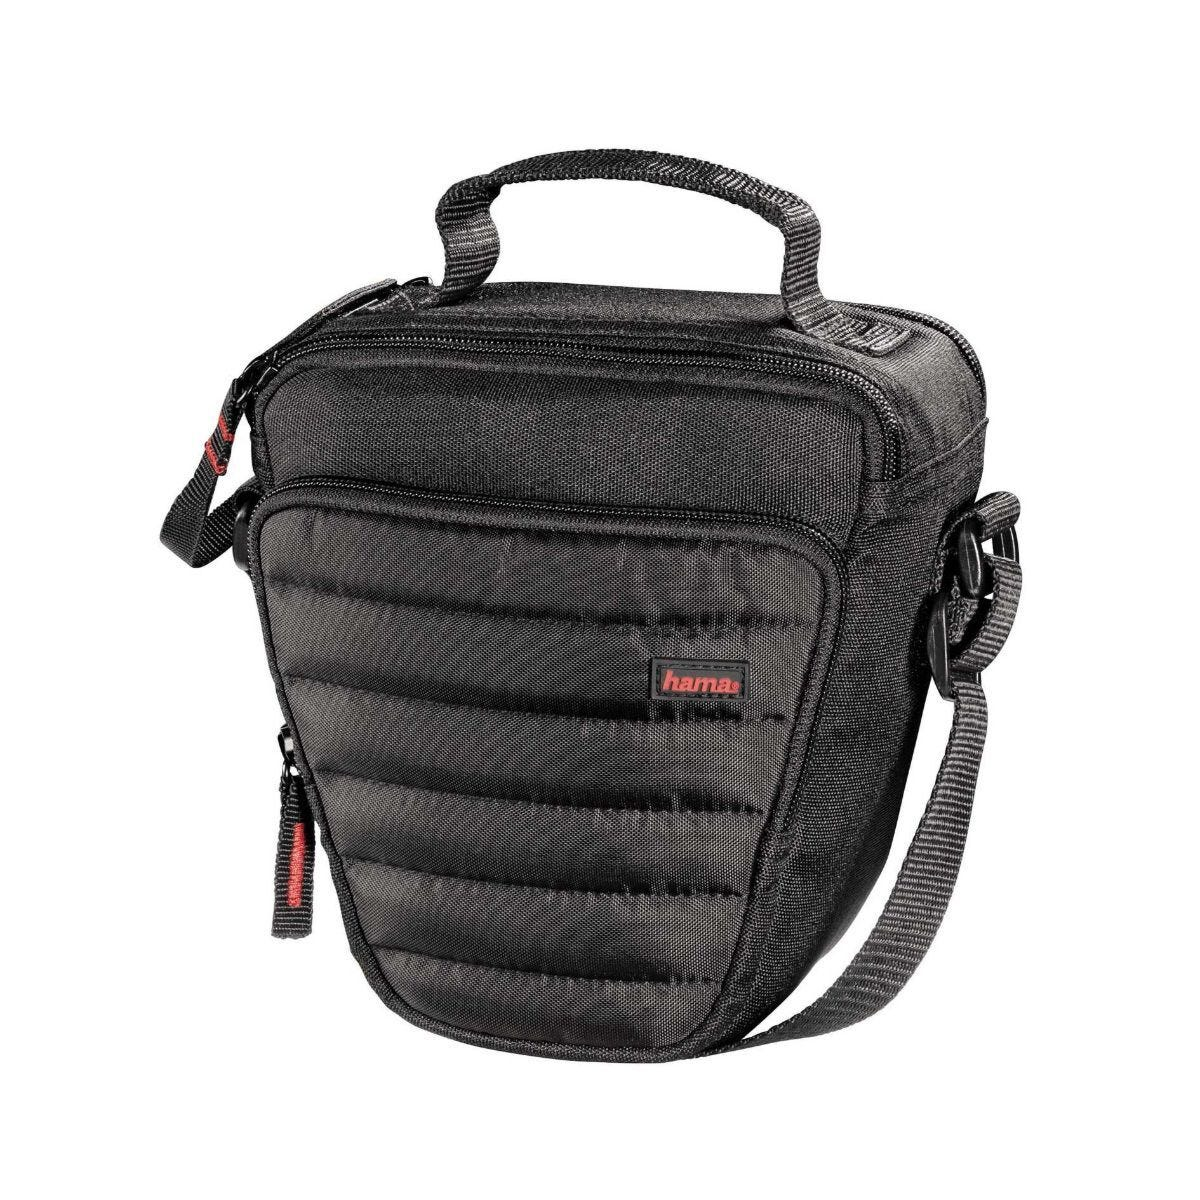 Hama Syscase Camera Bag 110 Colt